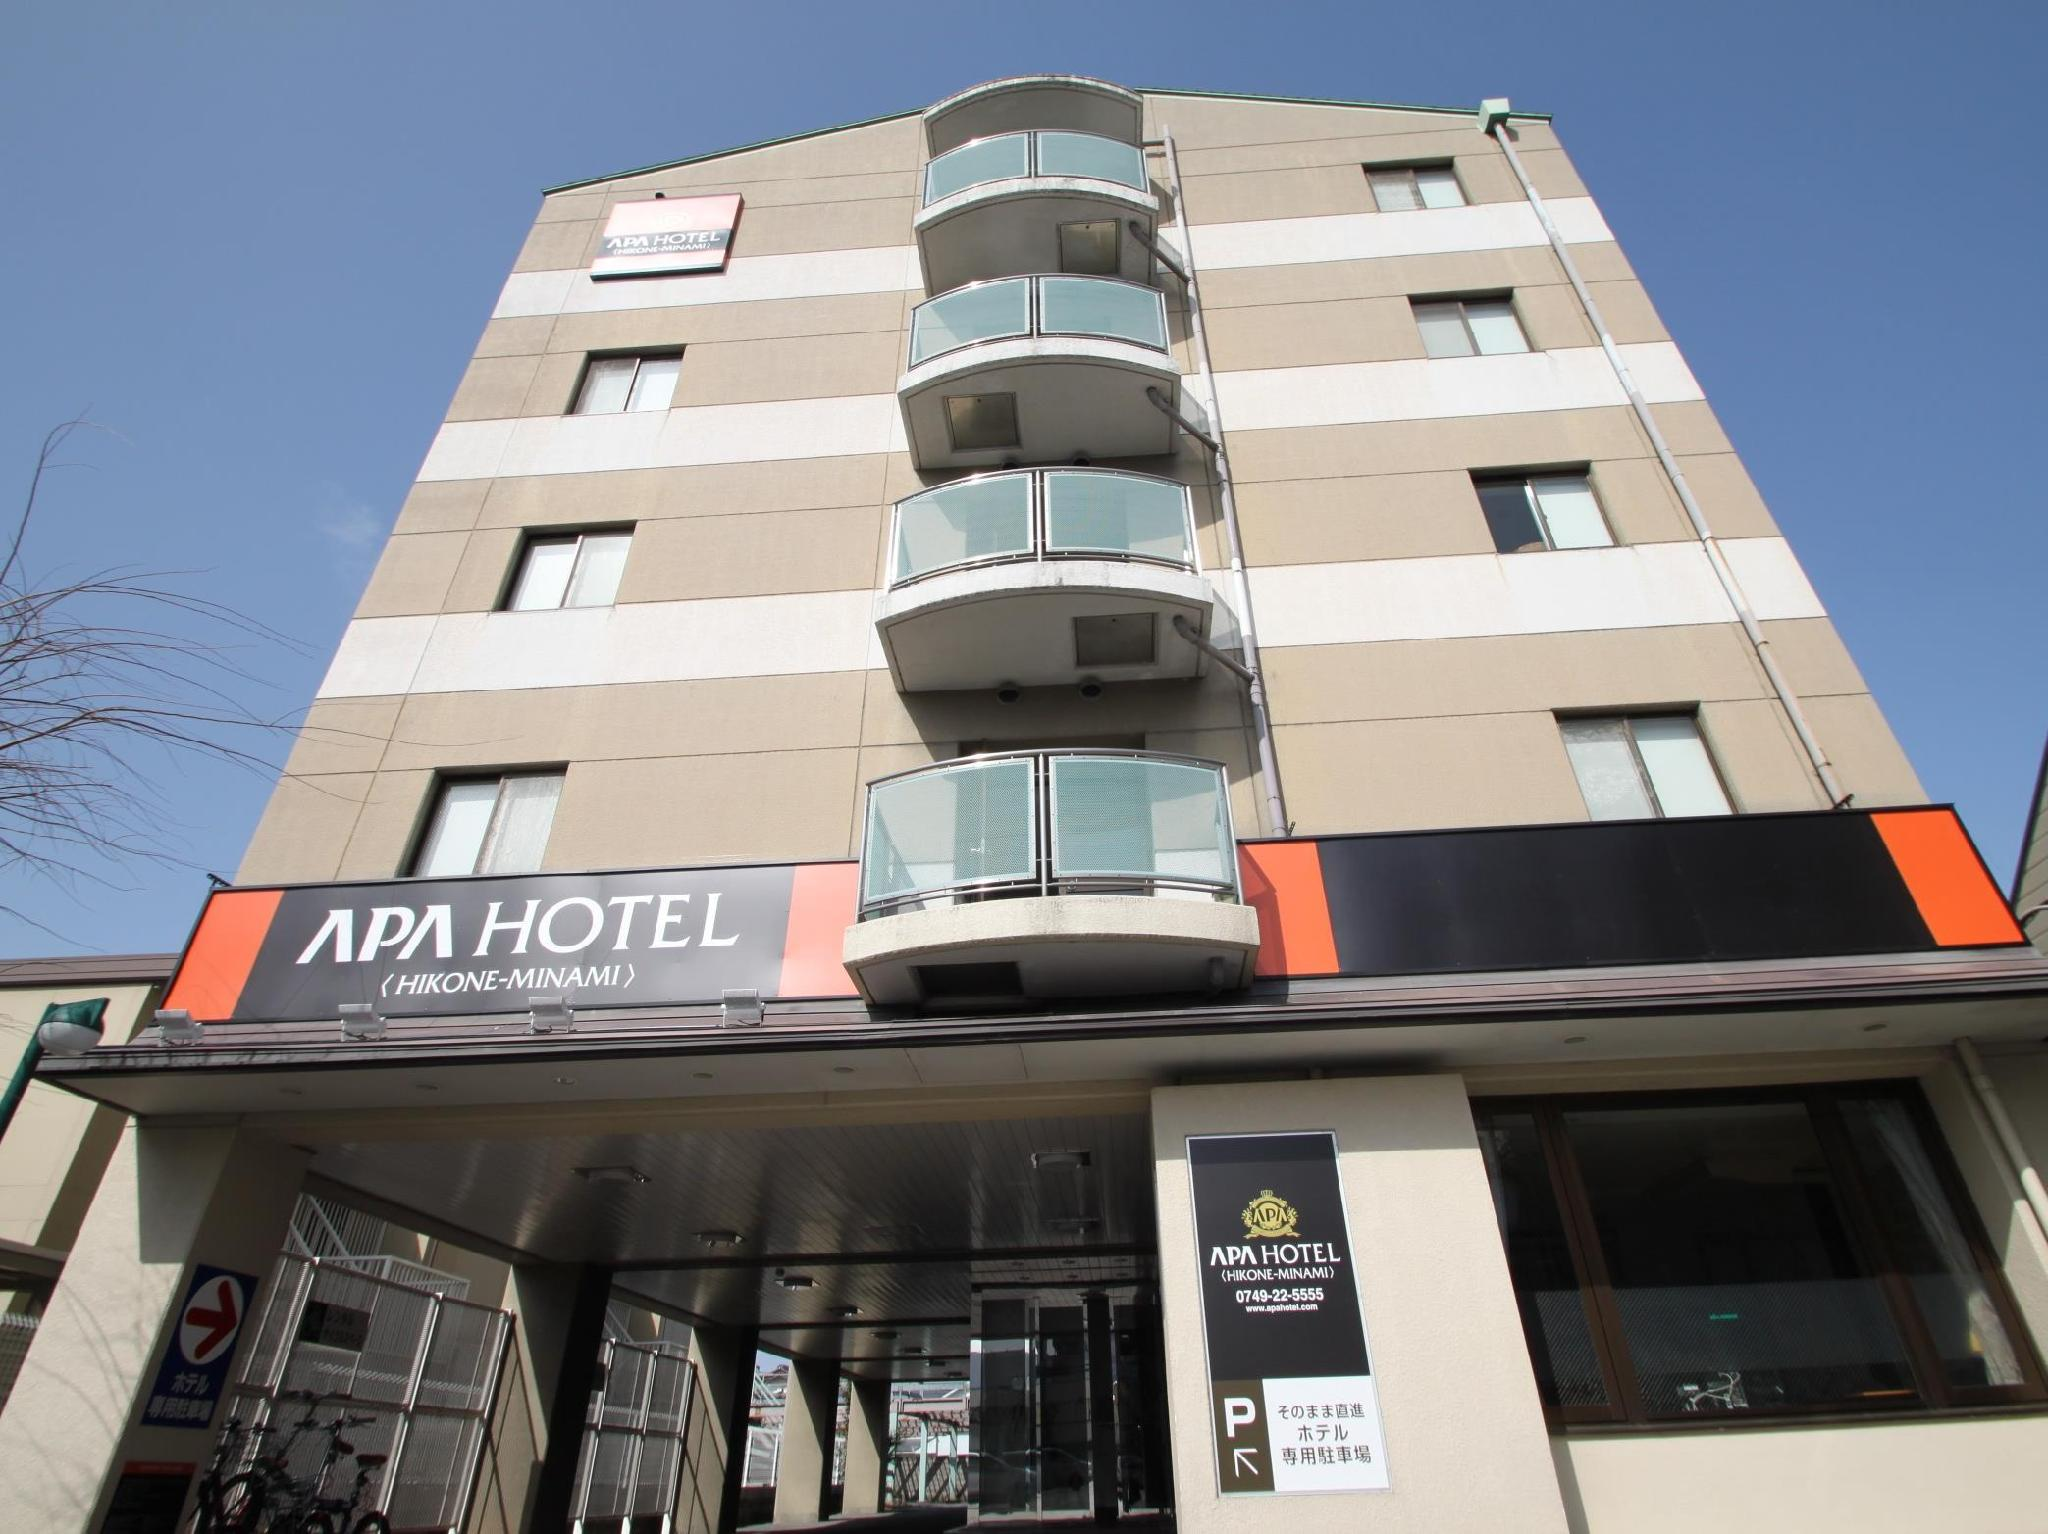 Shiga Hotels Reservation